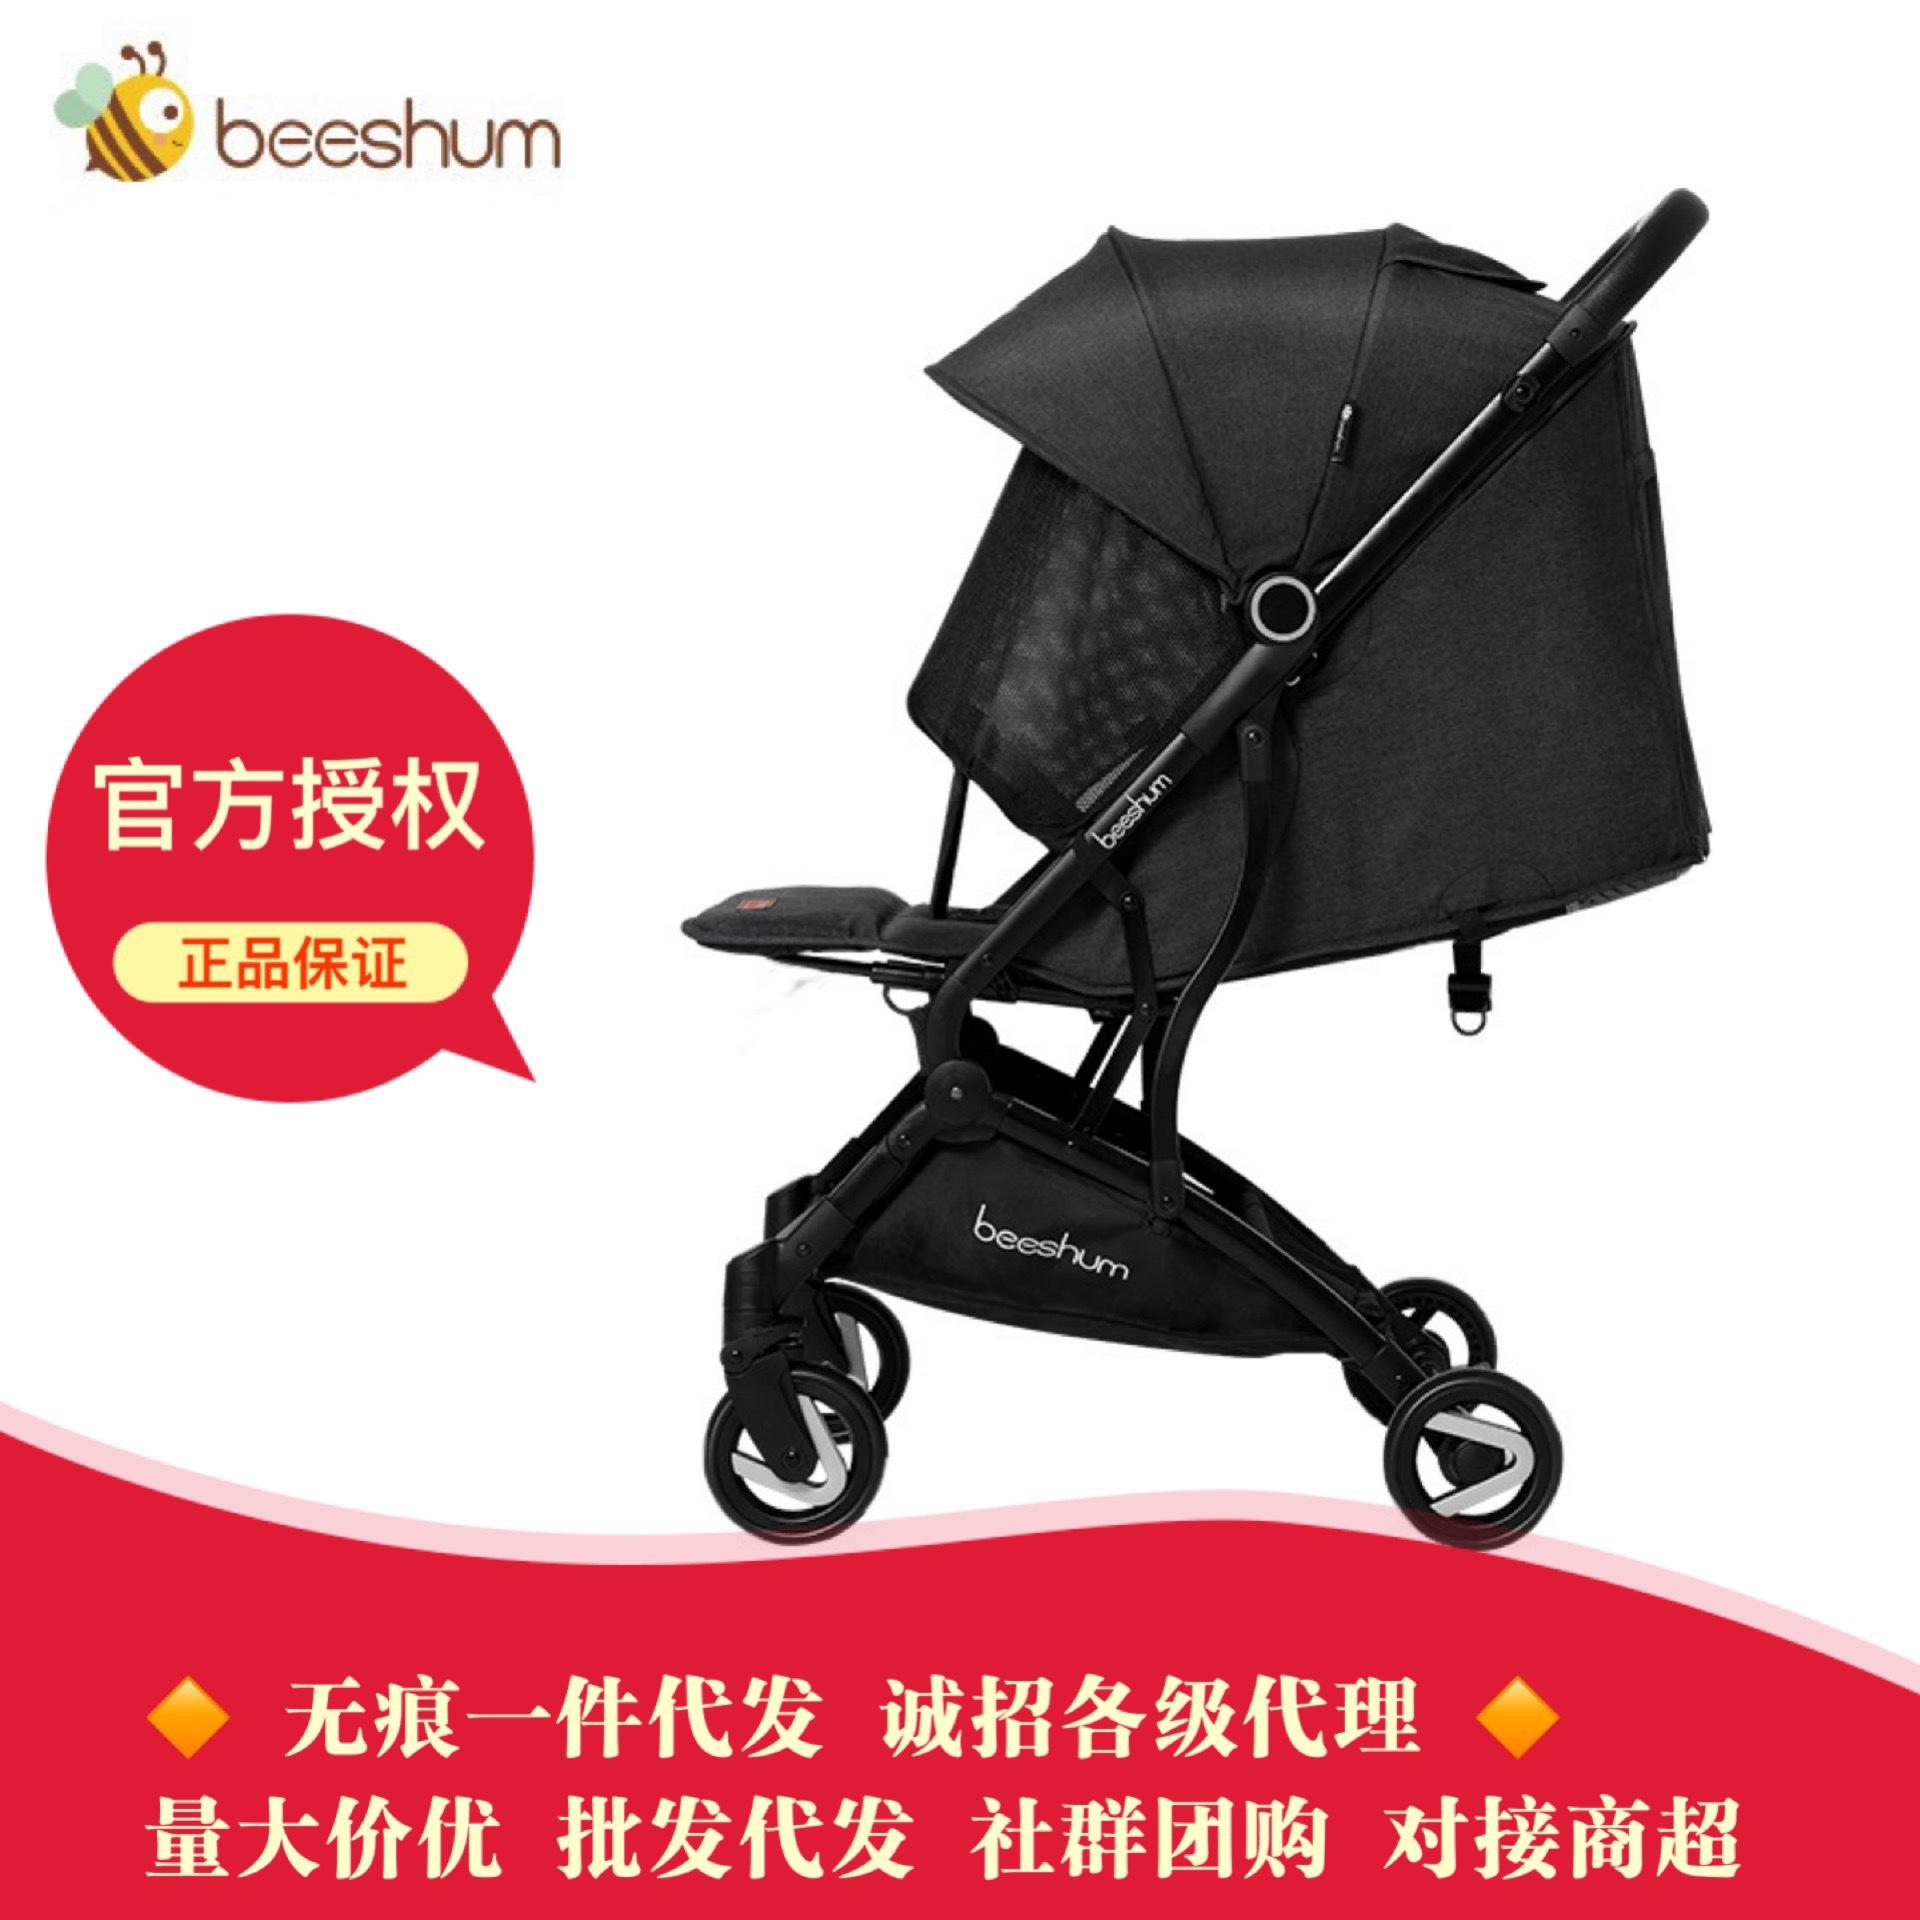 beeshum婴儿推车轻便折叠超轻小儿童手宝宝可坐可躺口袋伞车简易